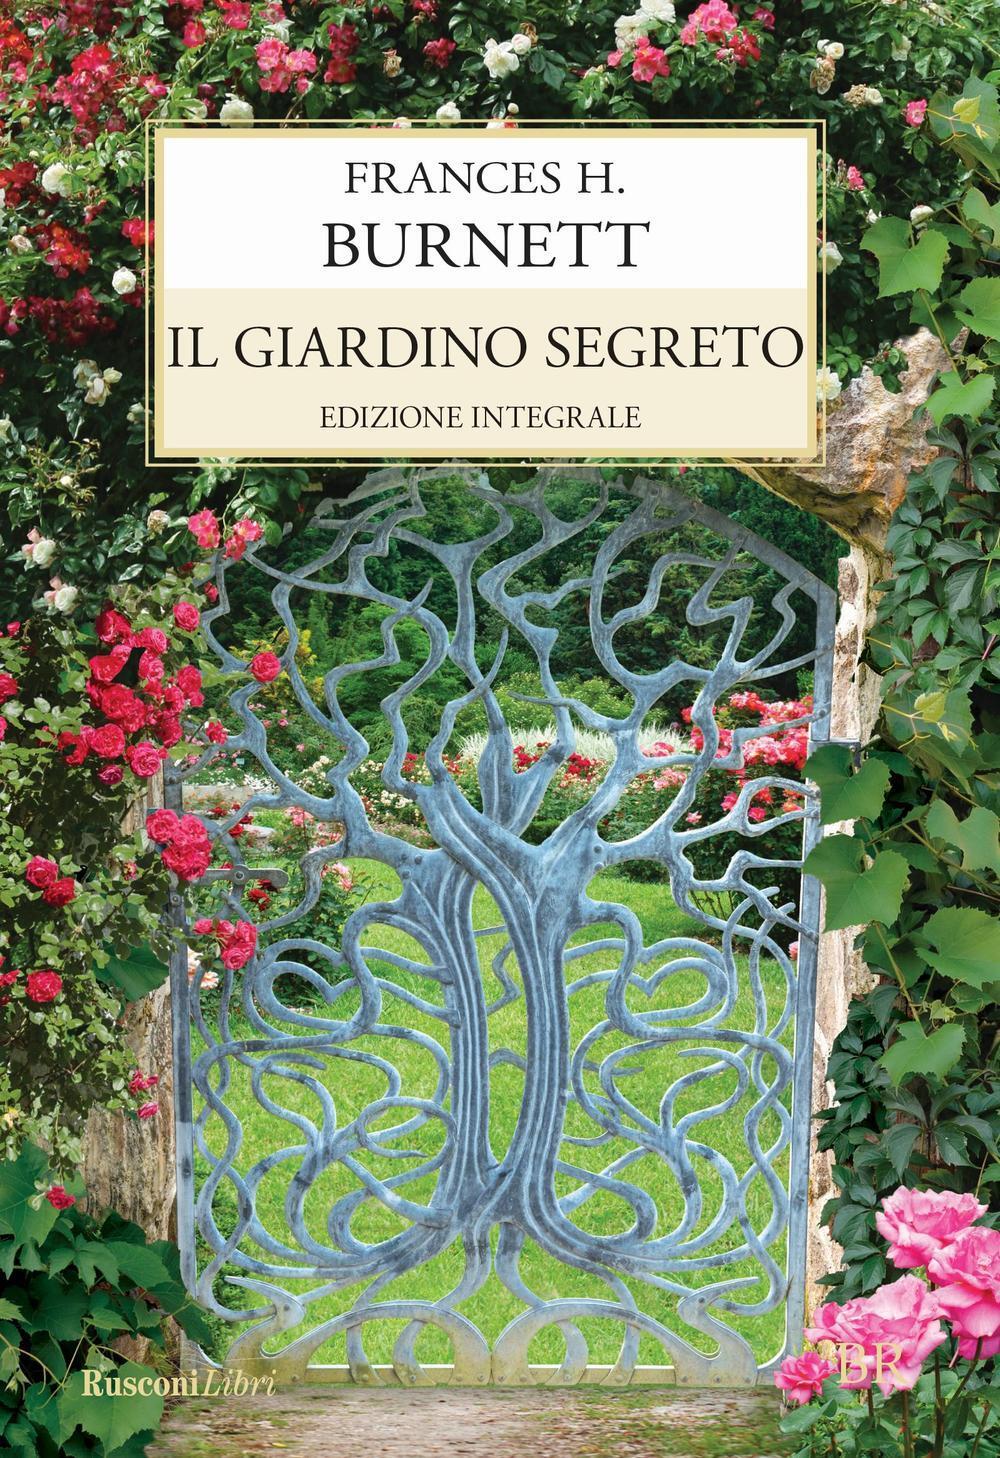 Il giardino segreto frances hodgson burnett libro - Il giardino segreto napoli ...